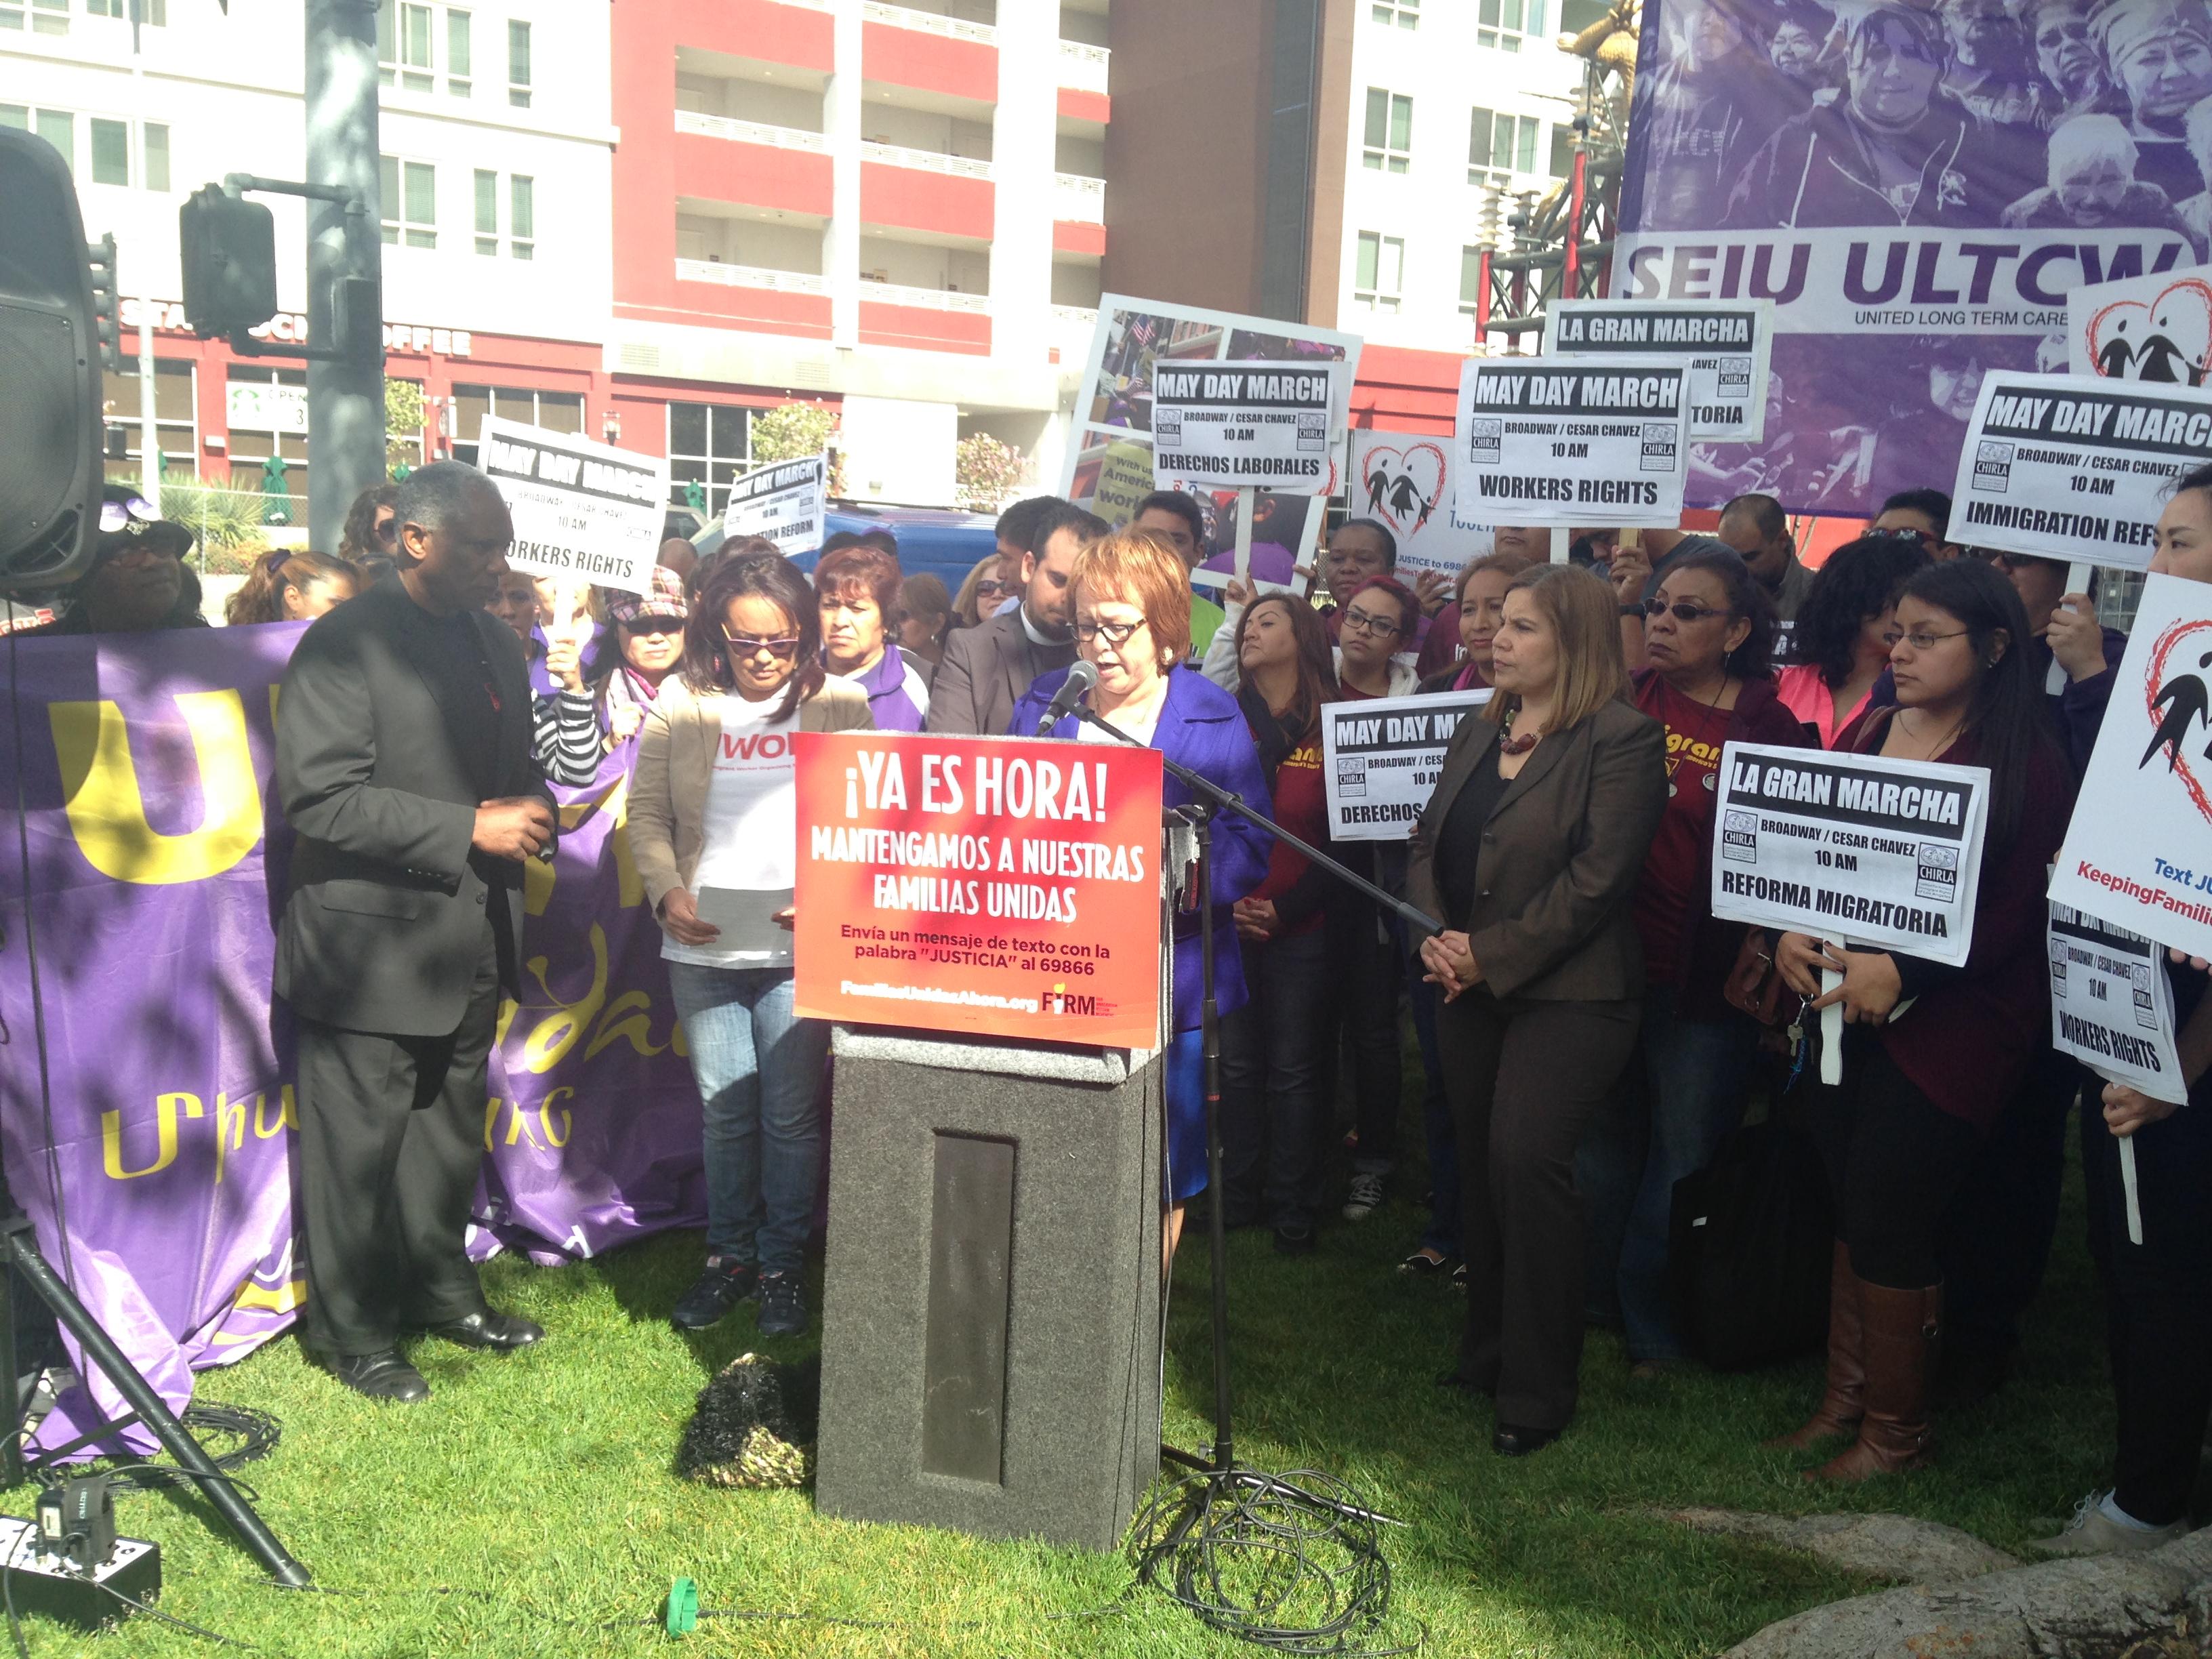 Maria Elena Durazo announces the 2014 May Day March in Downtown L.A. | Daina Beth Solomon